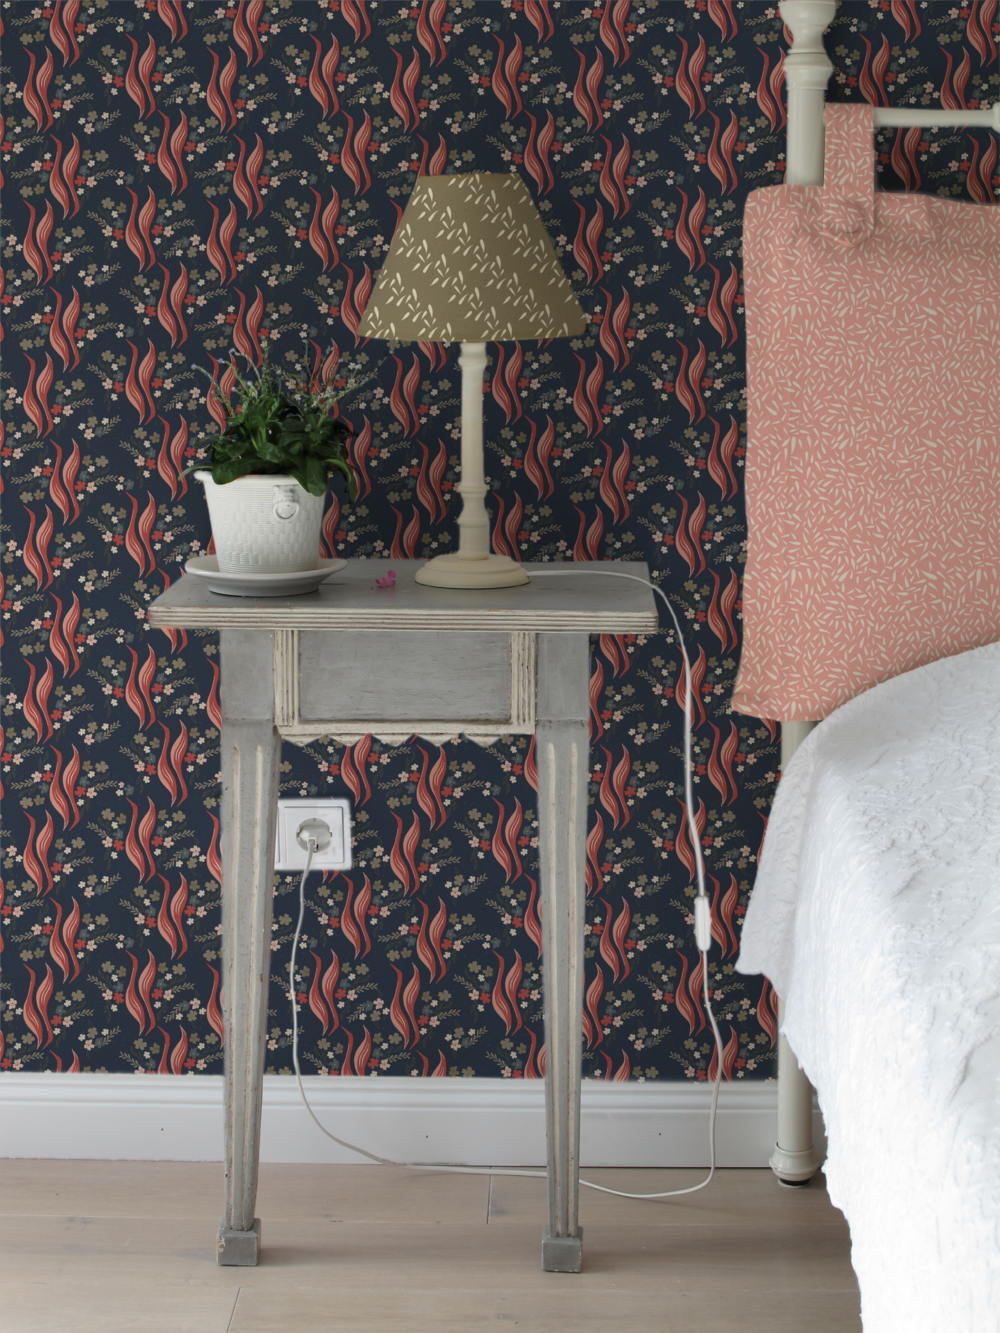 bedroom - wallpaper, lamp and pillow.png